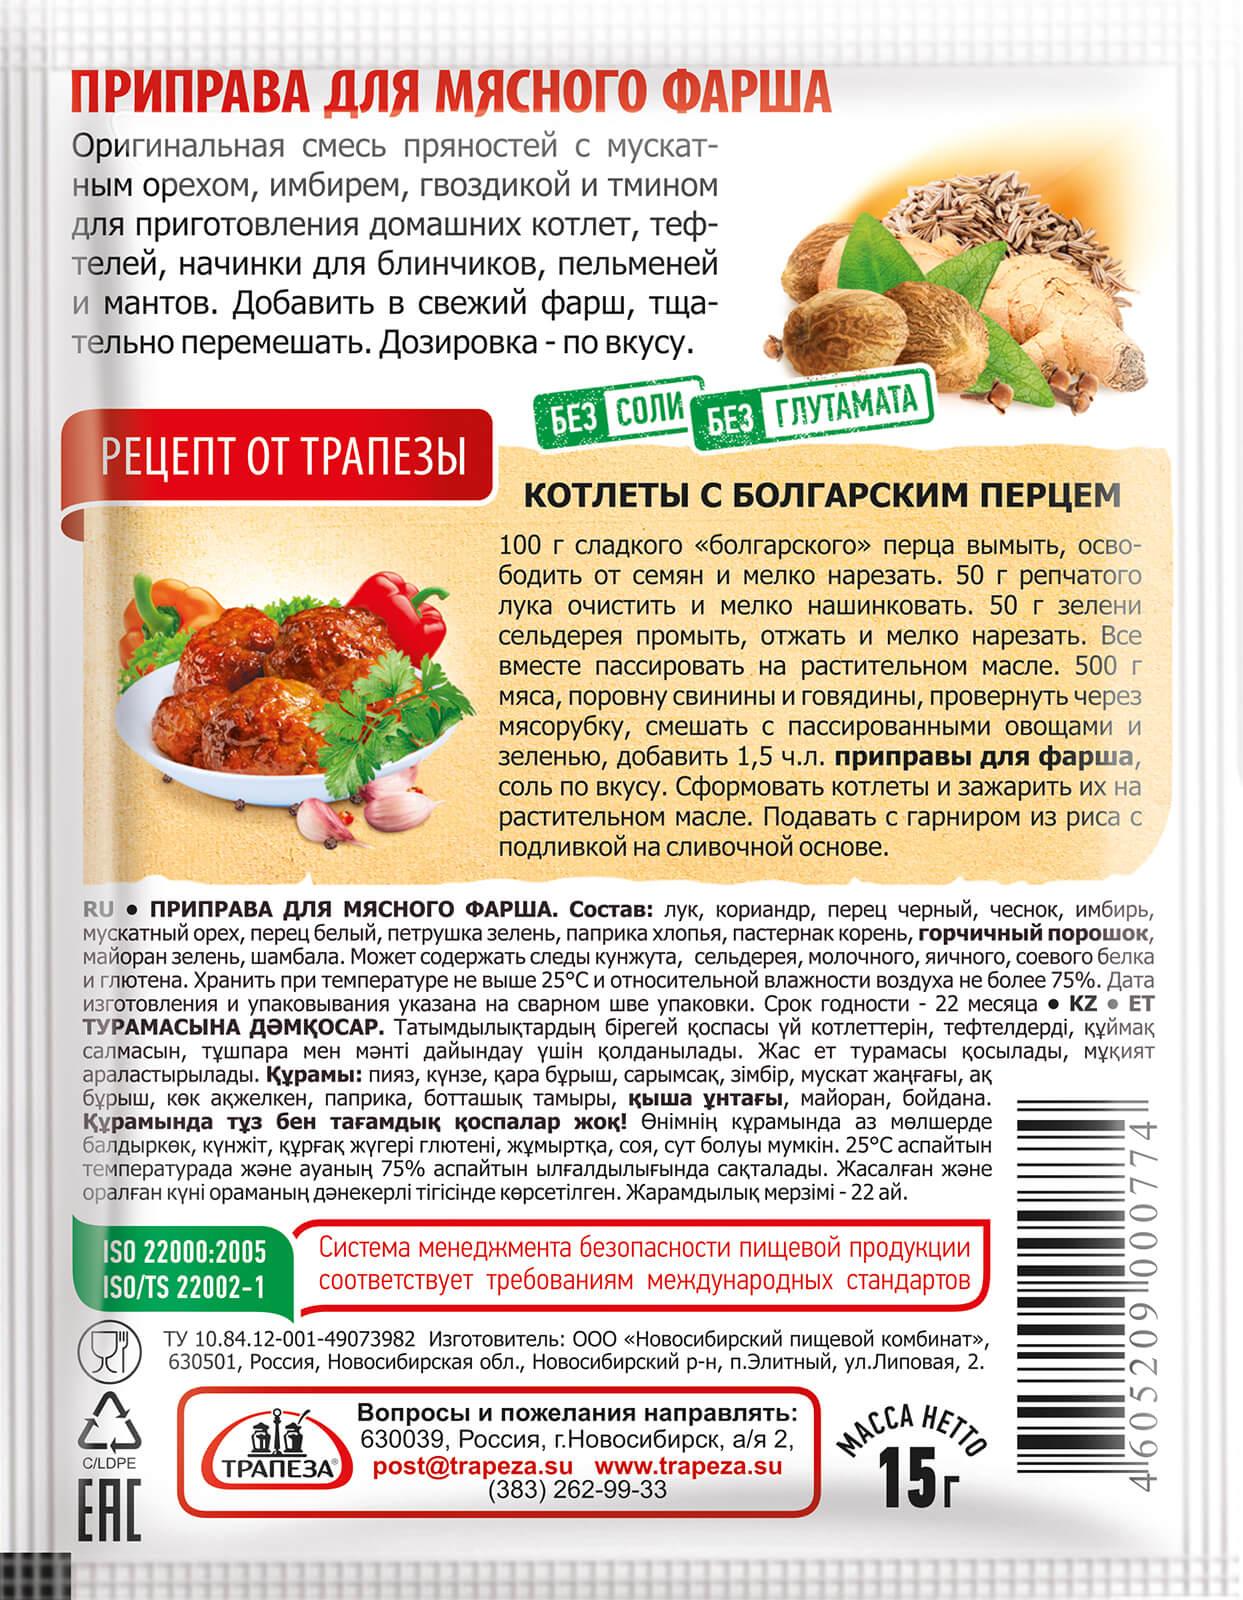 Приправа для мясного фарша Трапеза 15г.